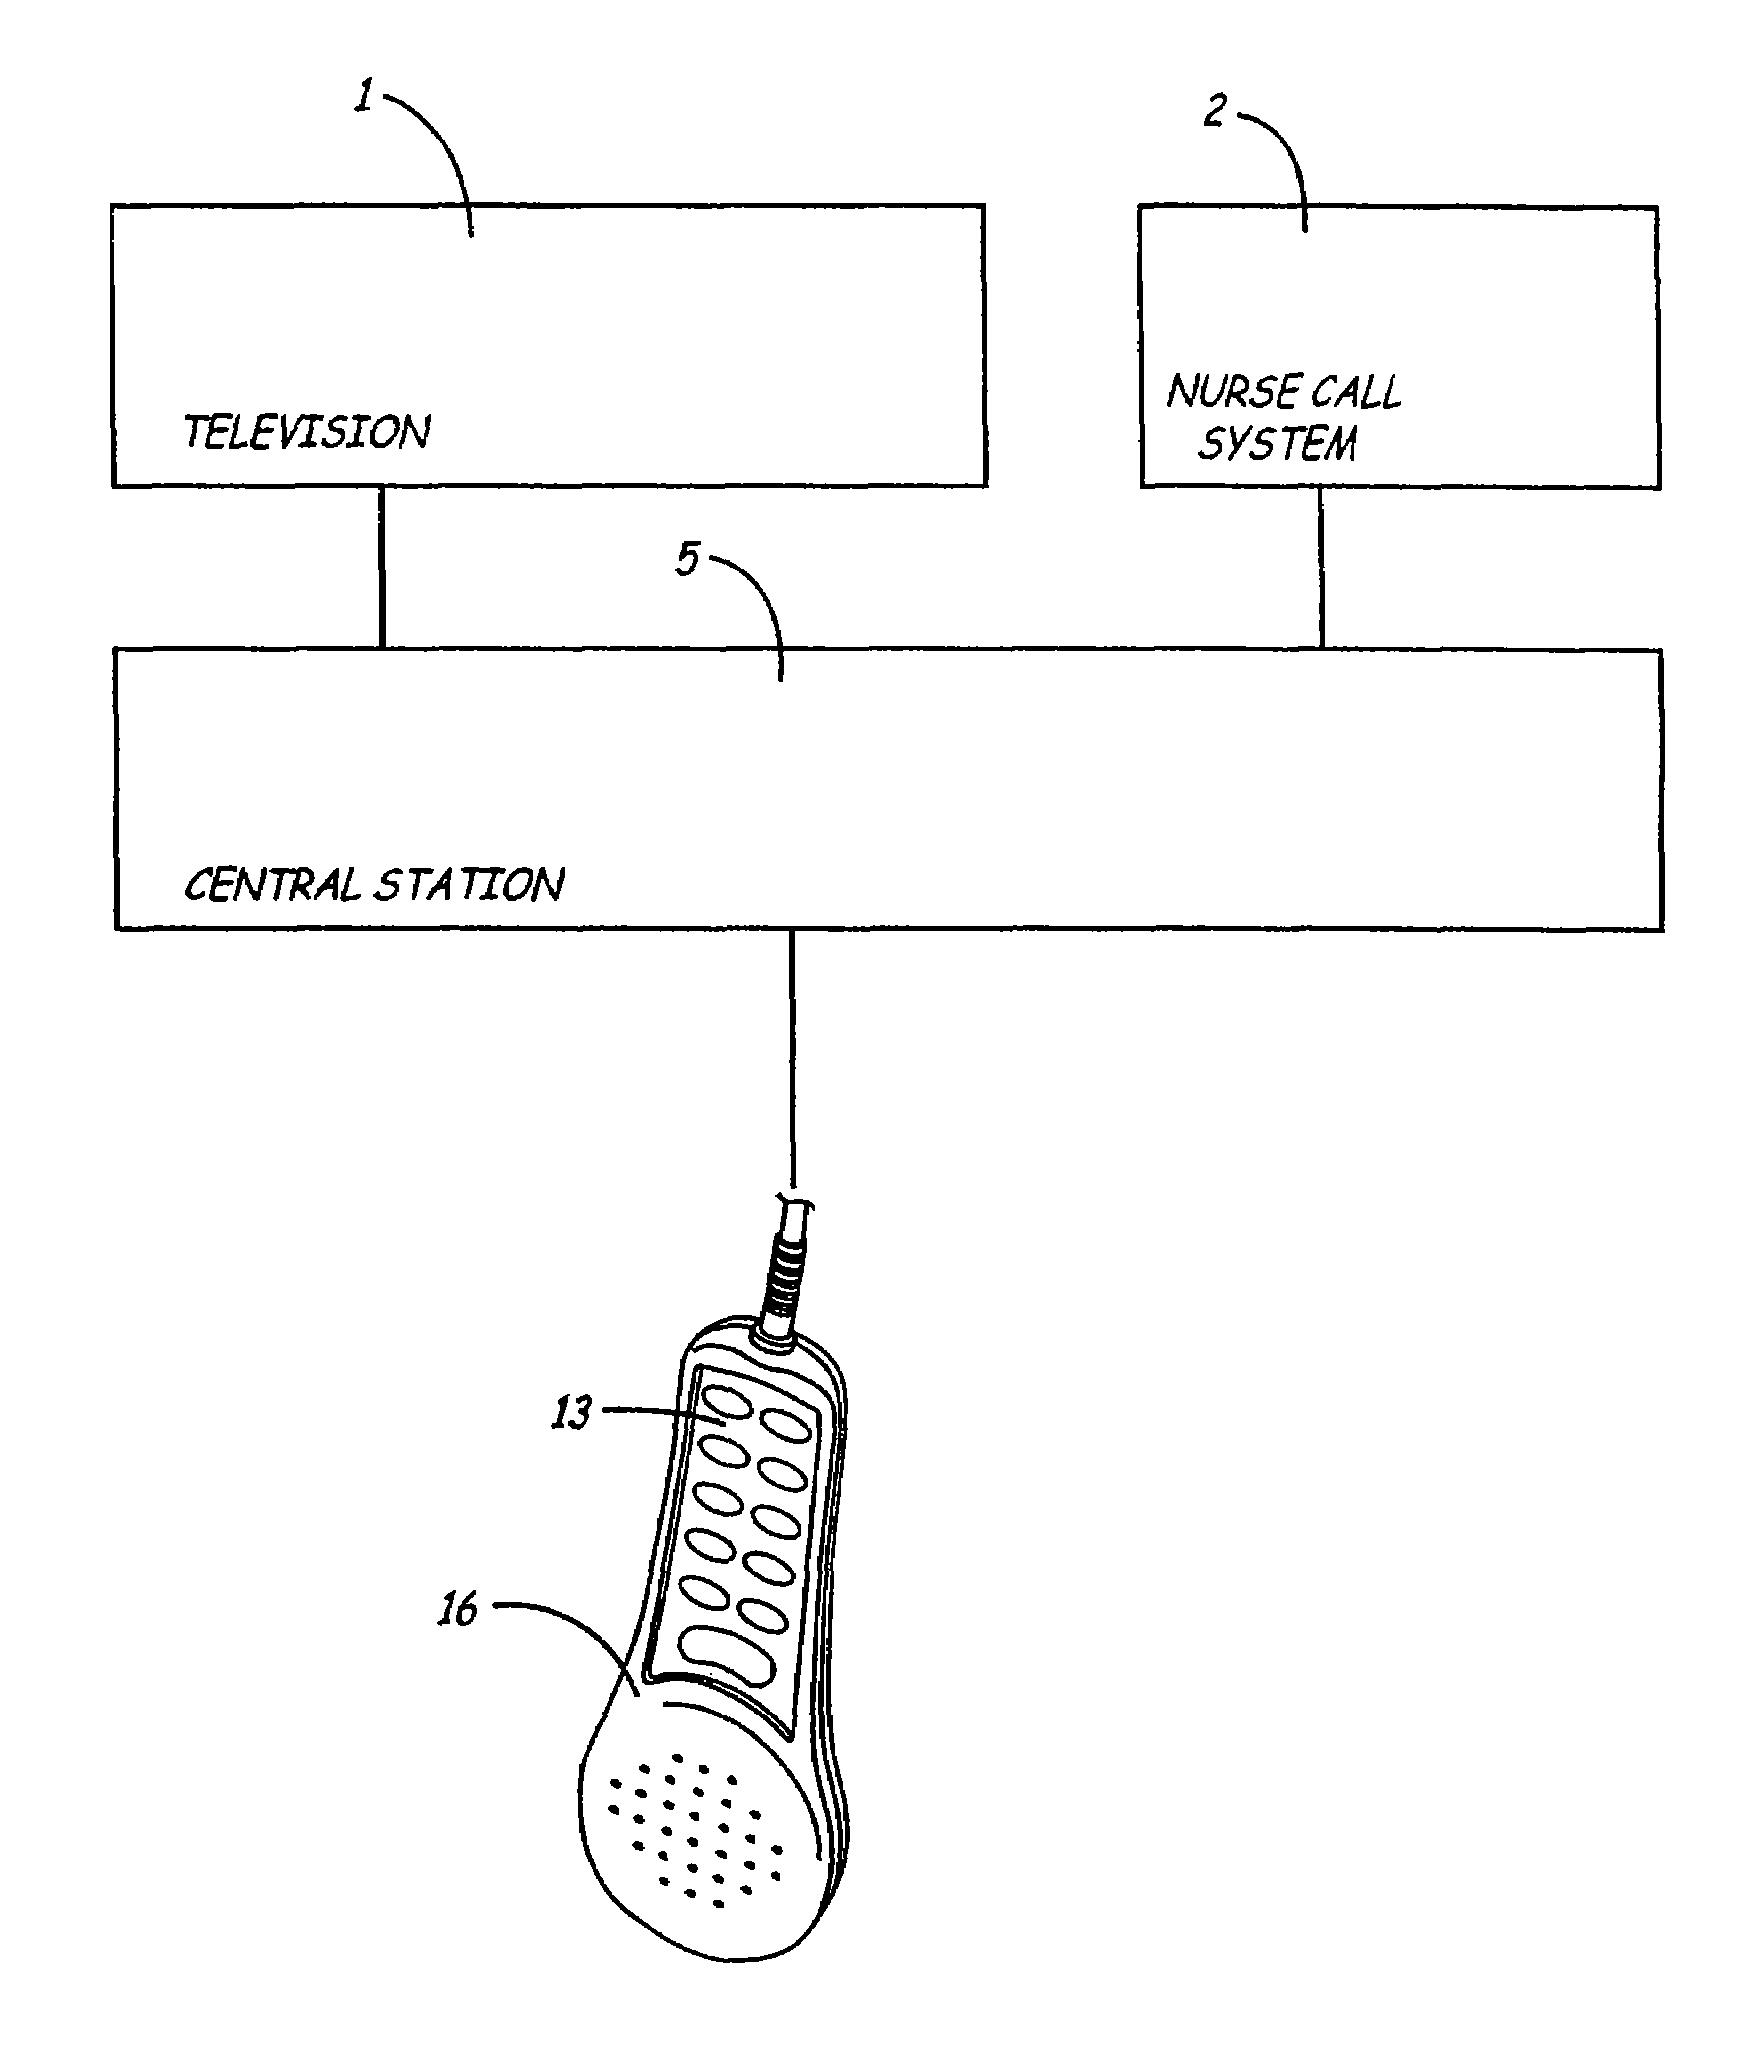 Pillow Speaker Wiring Diagram Worksheet And Crutchfield Diagrams Tv Curbell Der Analoge Schalter Ii Mc14066 Cd4066 Rh Shopehomedesigns Kawen Pw Car Audio